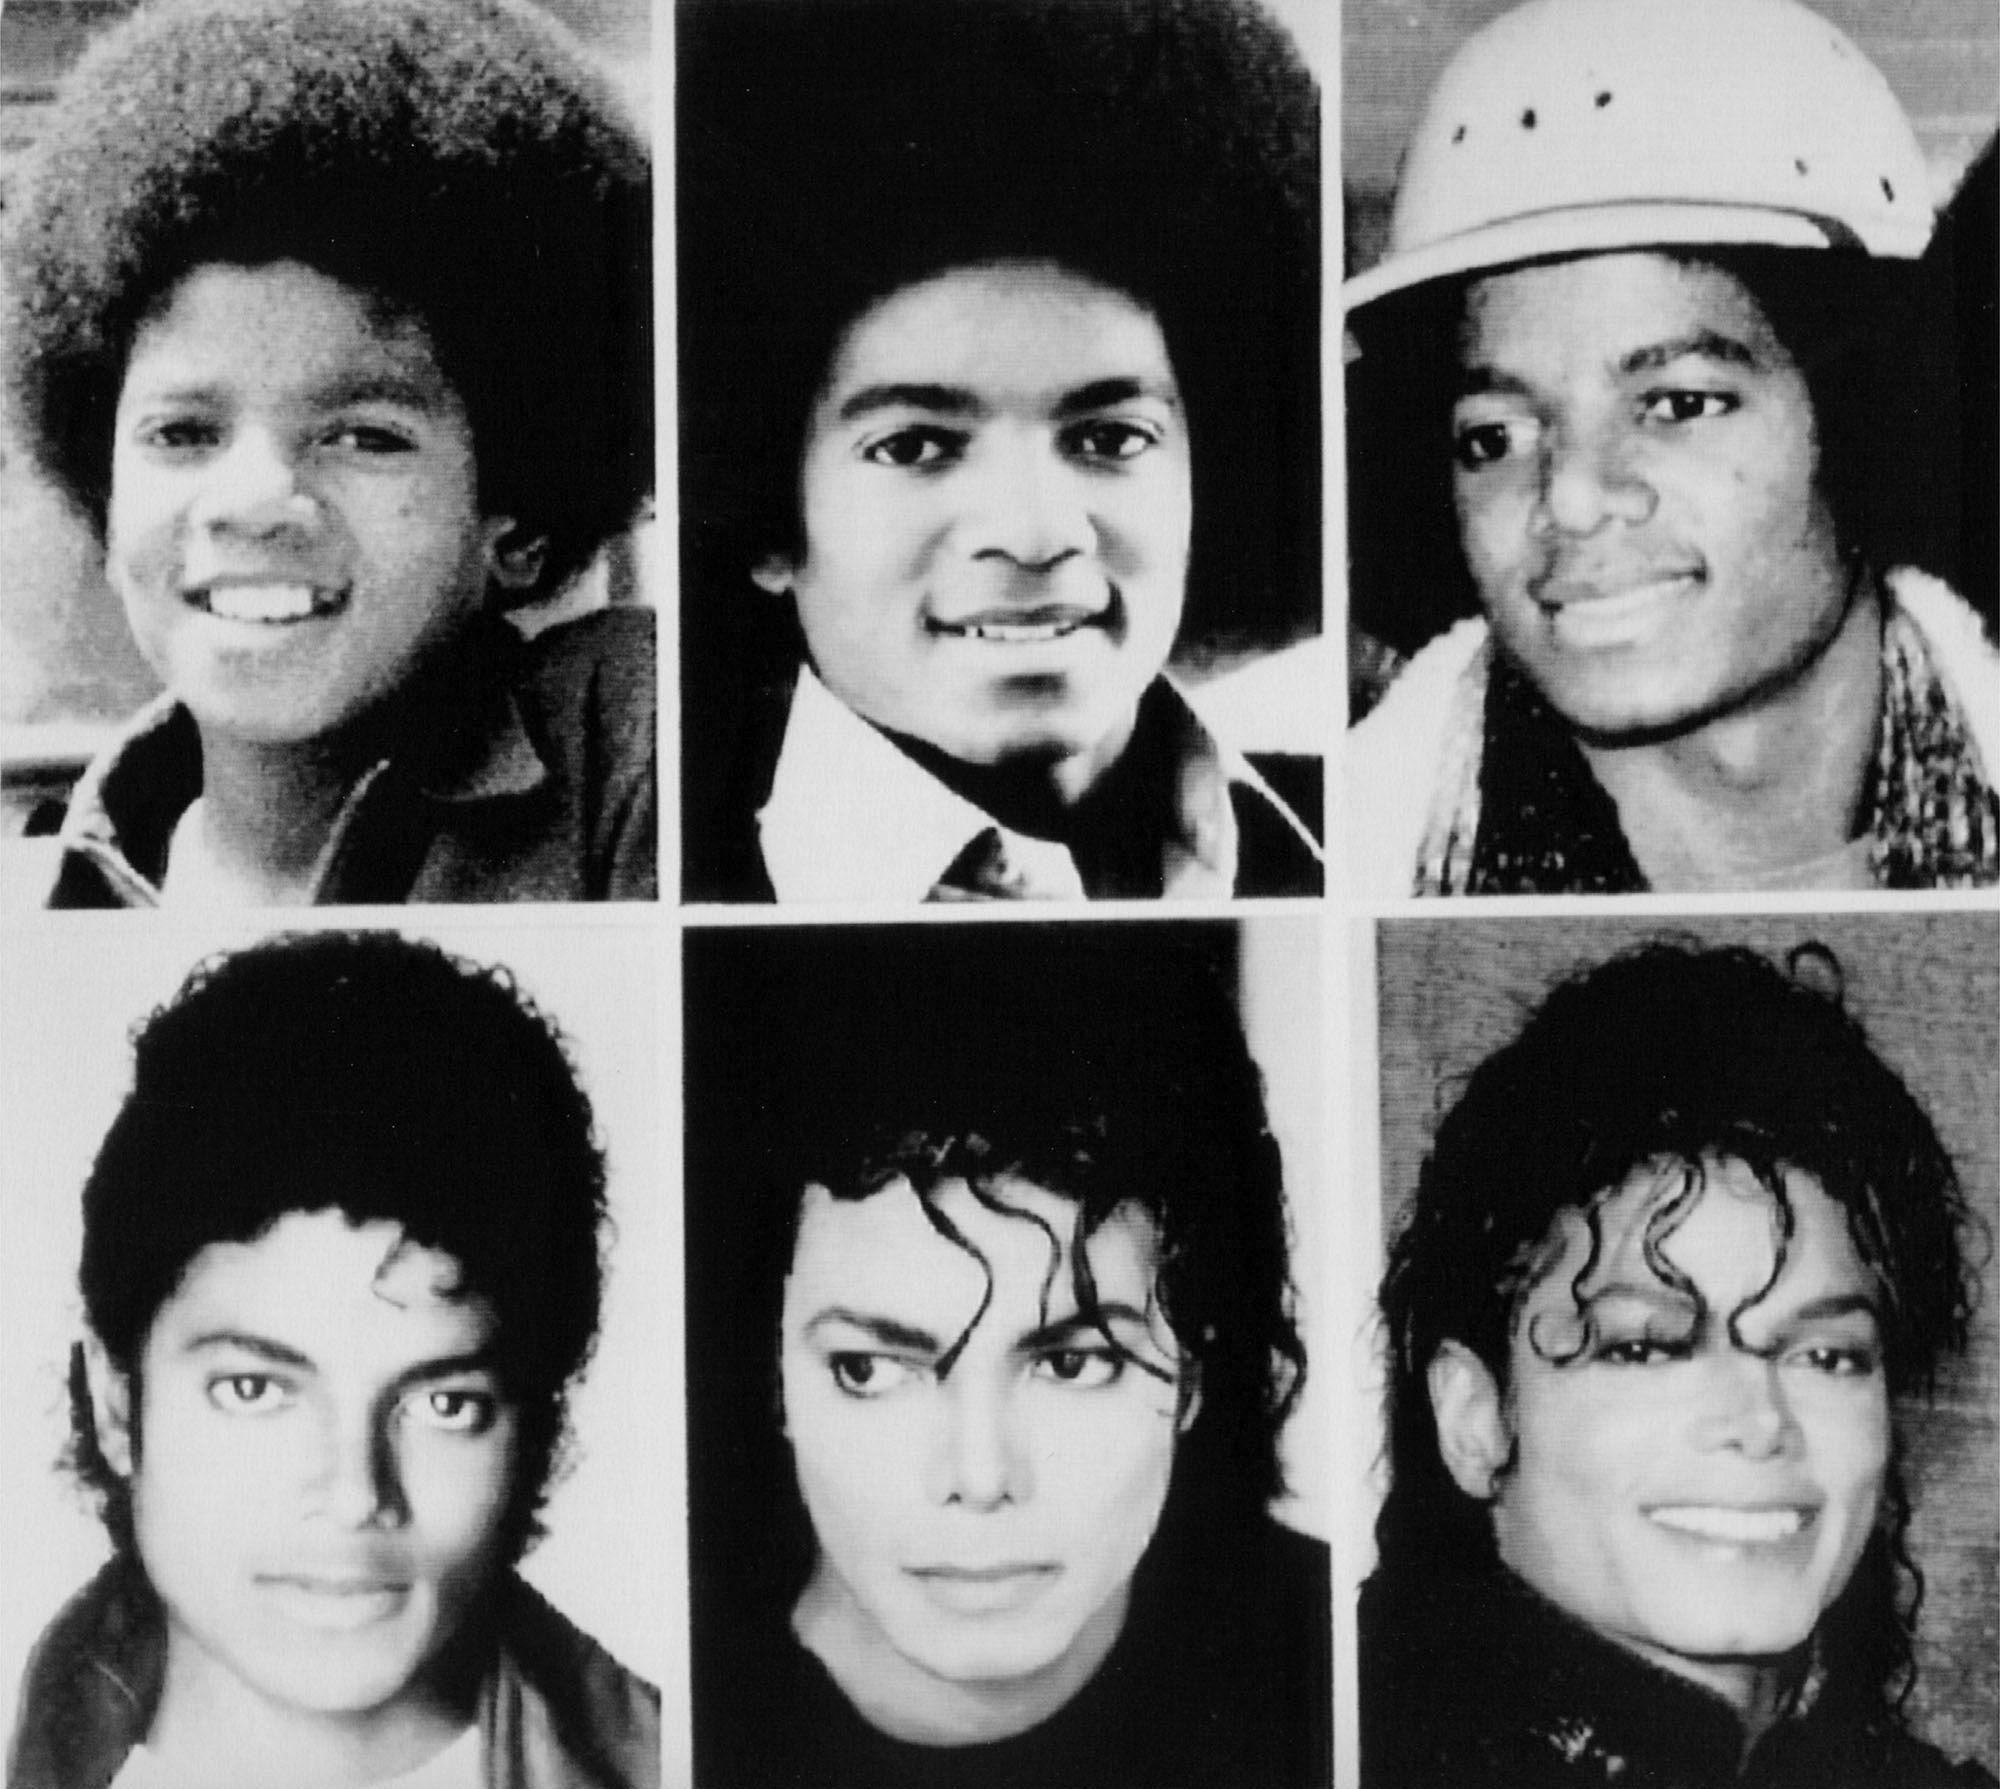 Michael jackson facial transition